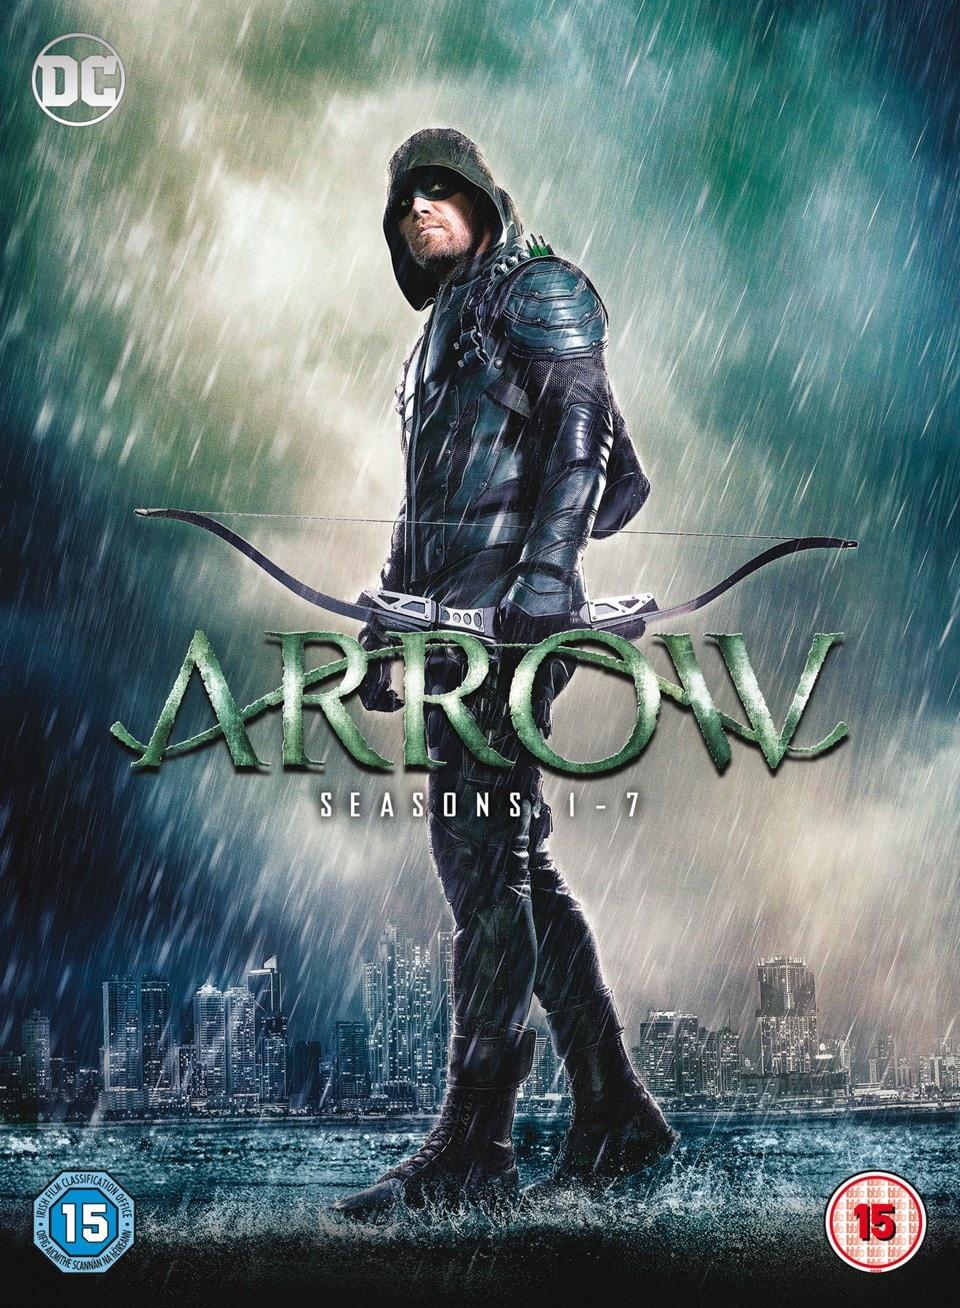 Arrow: Seasons 1-7 - 1